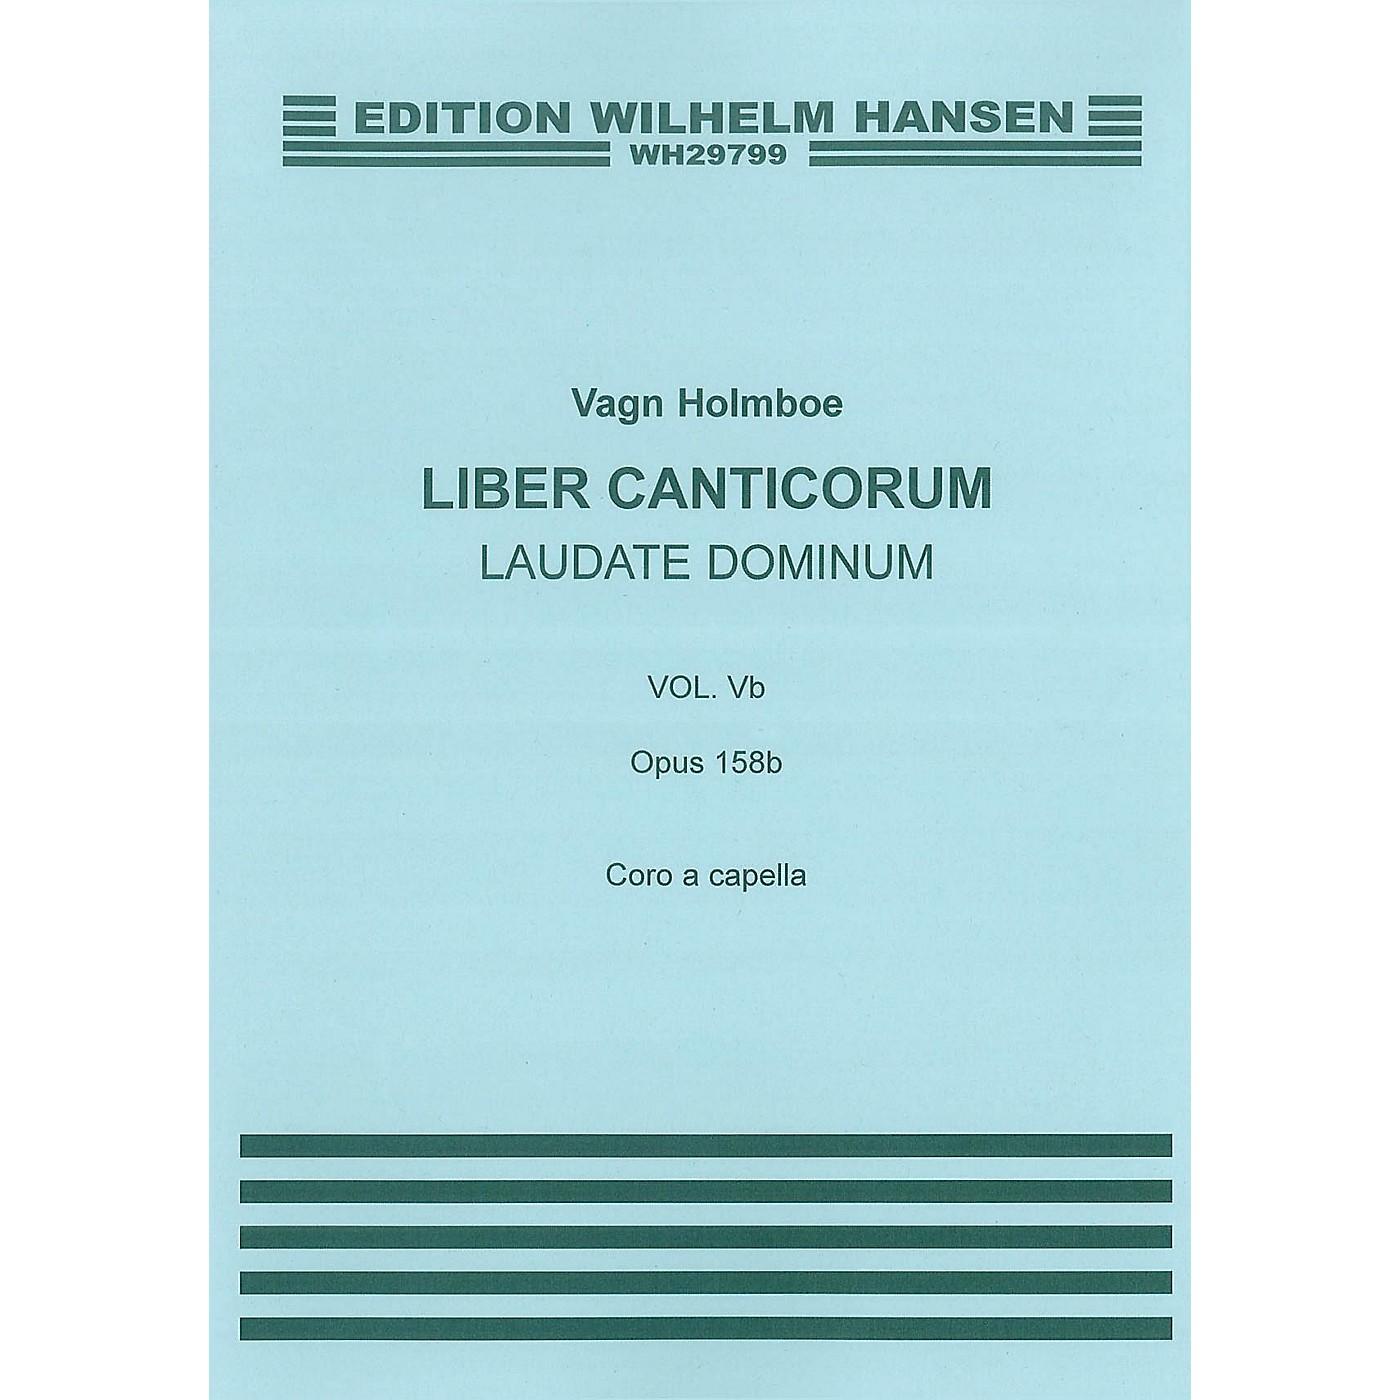 Wilhelm Hansen Laudate Dominum (Op.158b) SATB thumbnail